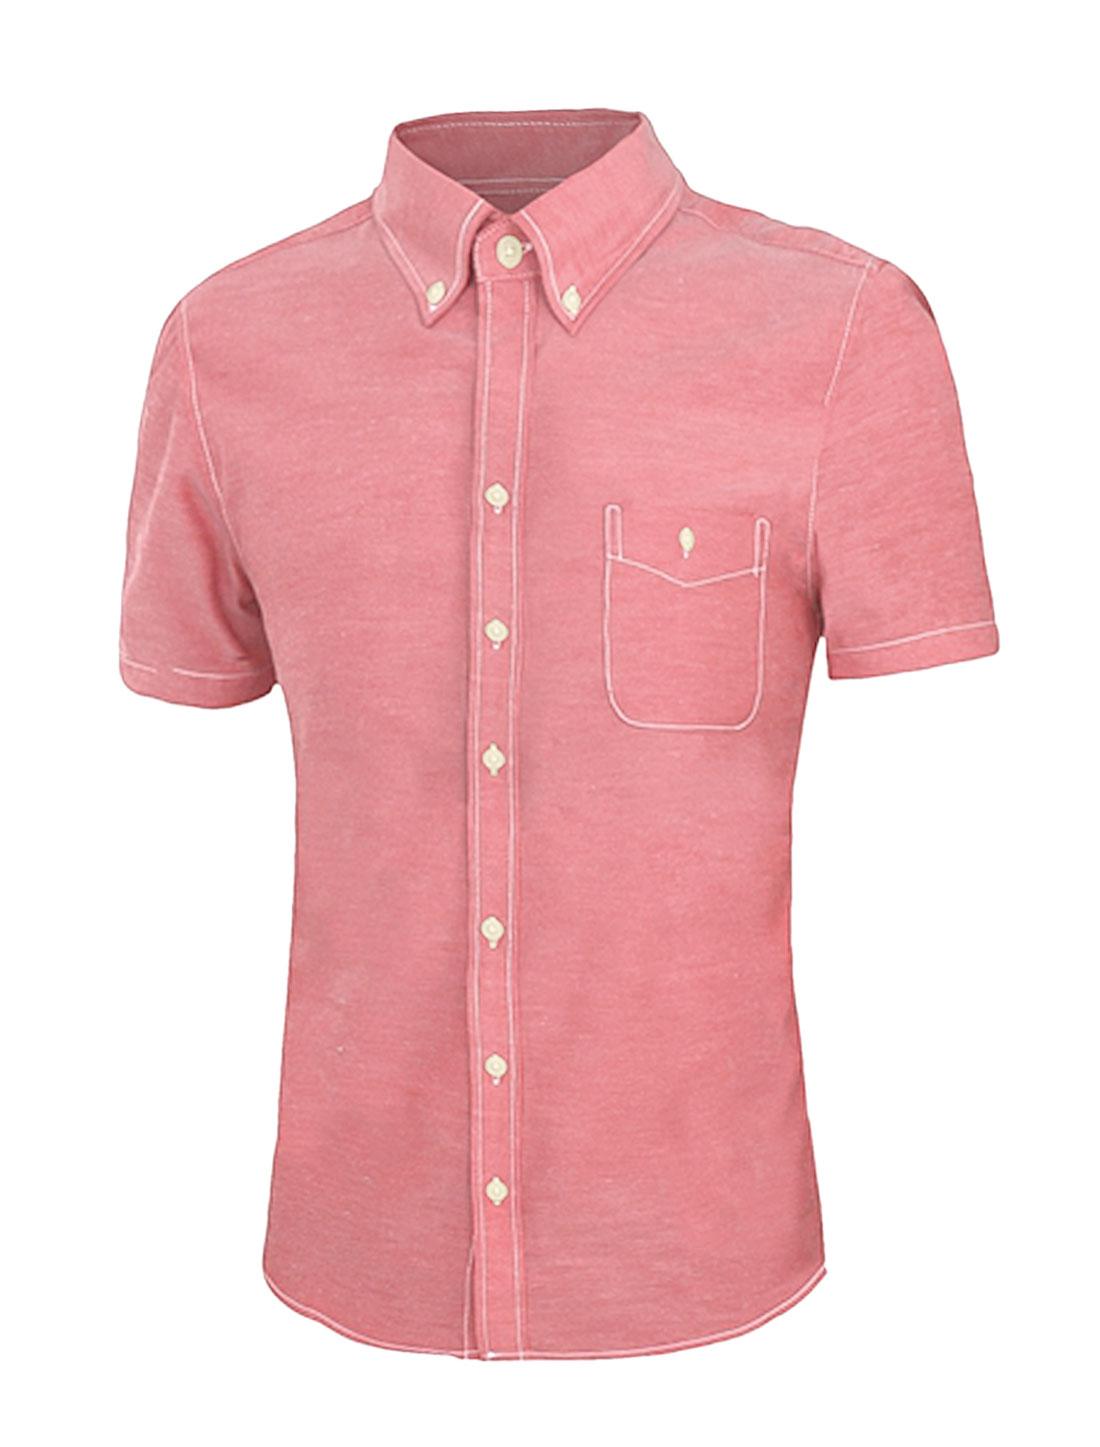 Men Single Breasted Pocket Short Sleeve Shirt Red M